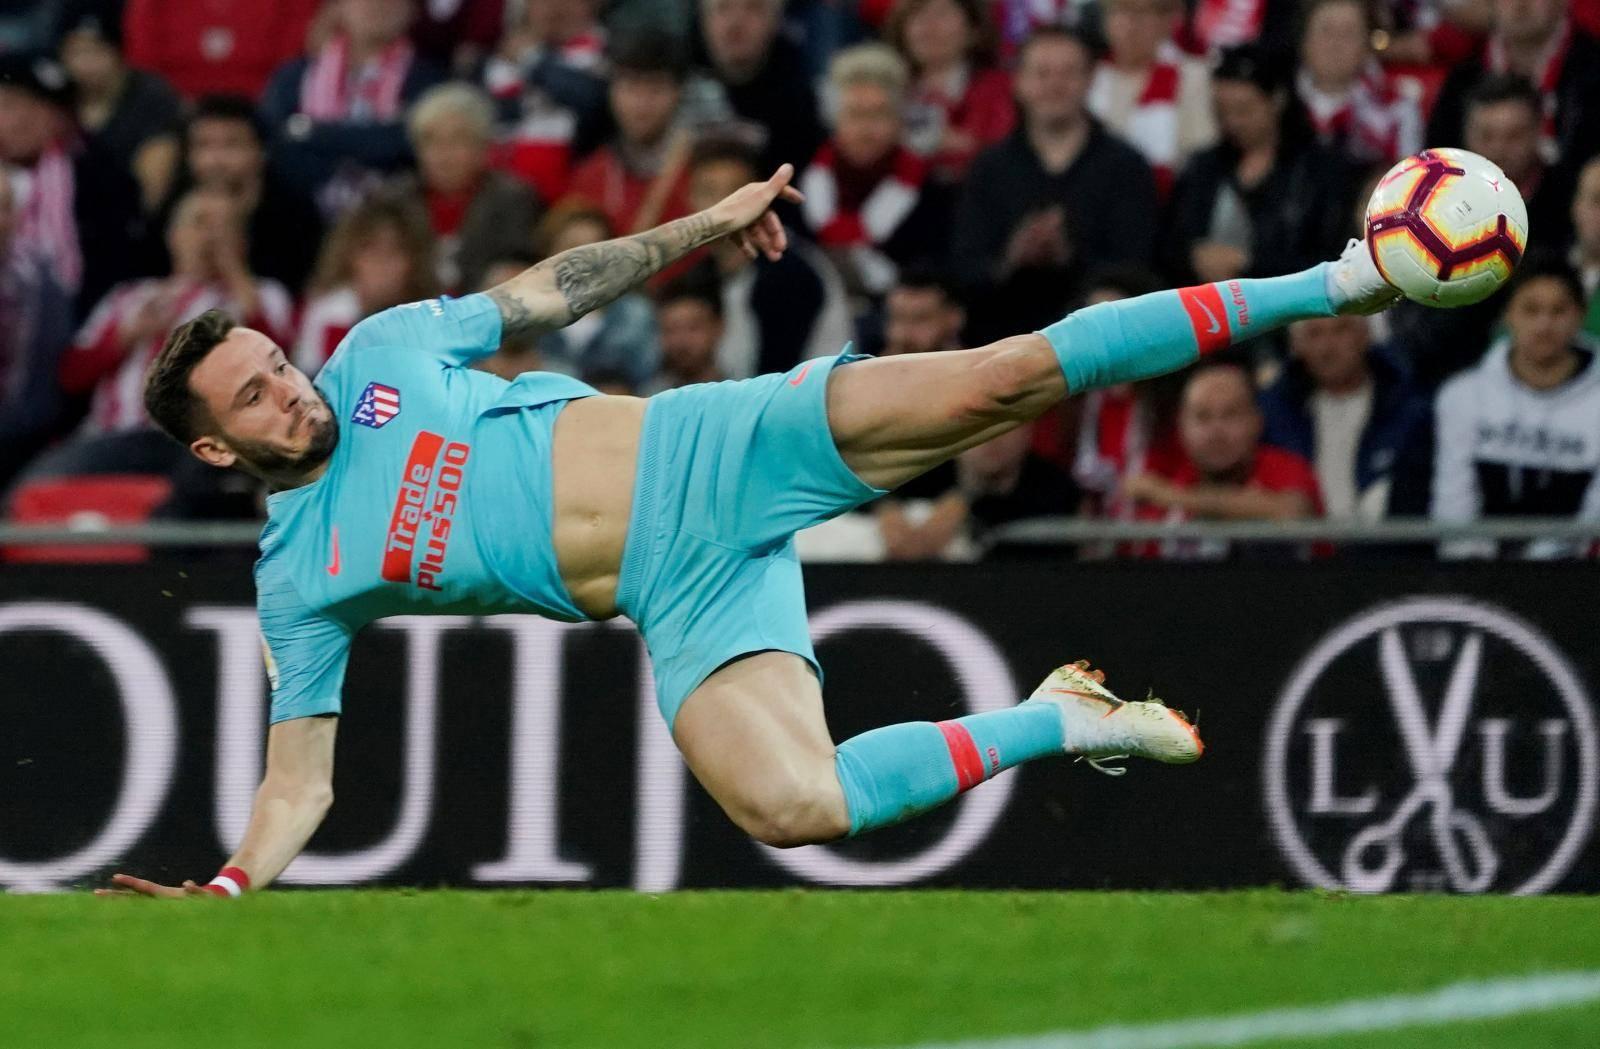 La Liga Santander - Athletic Bilbao v Atletico Madrid